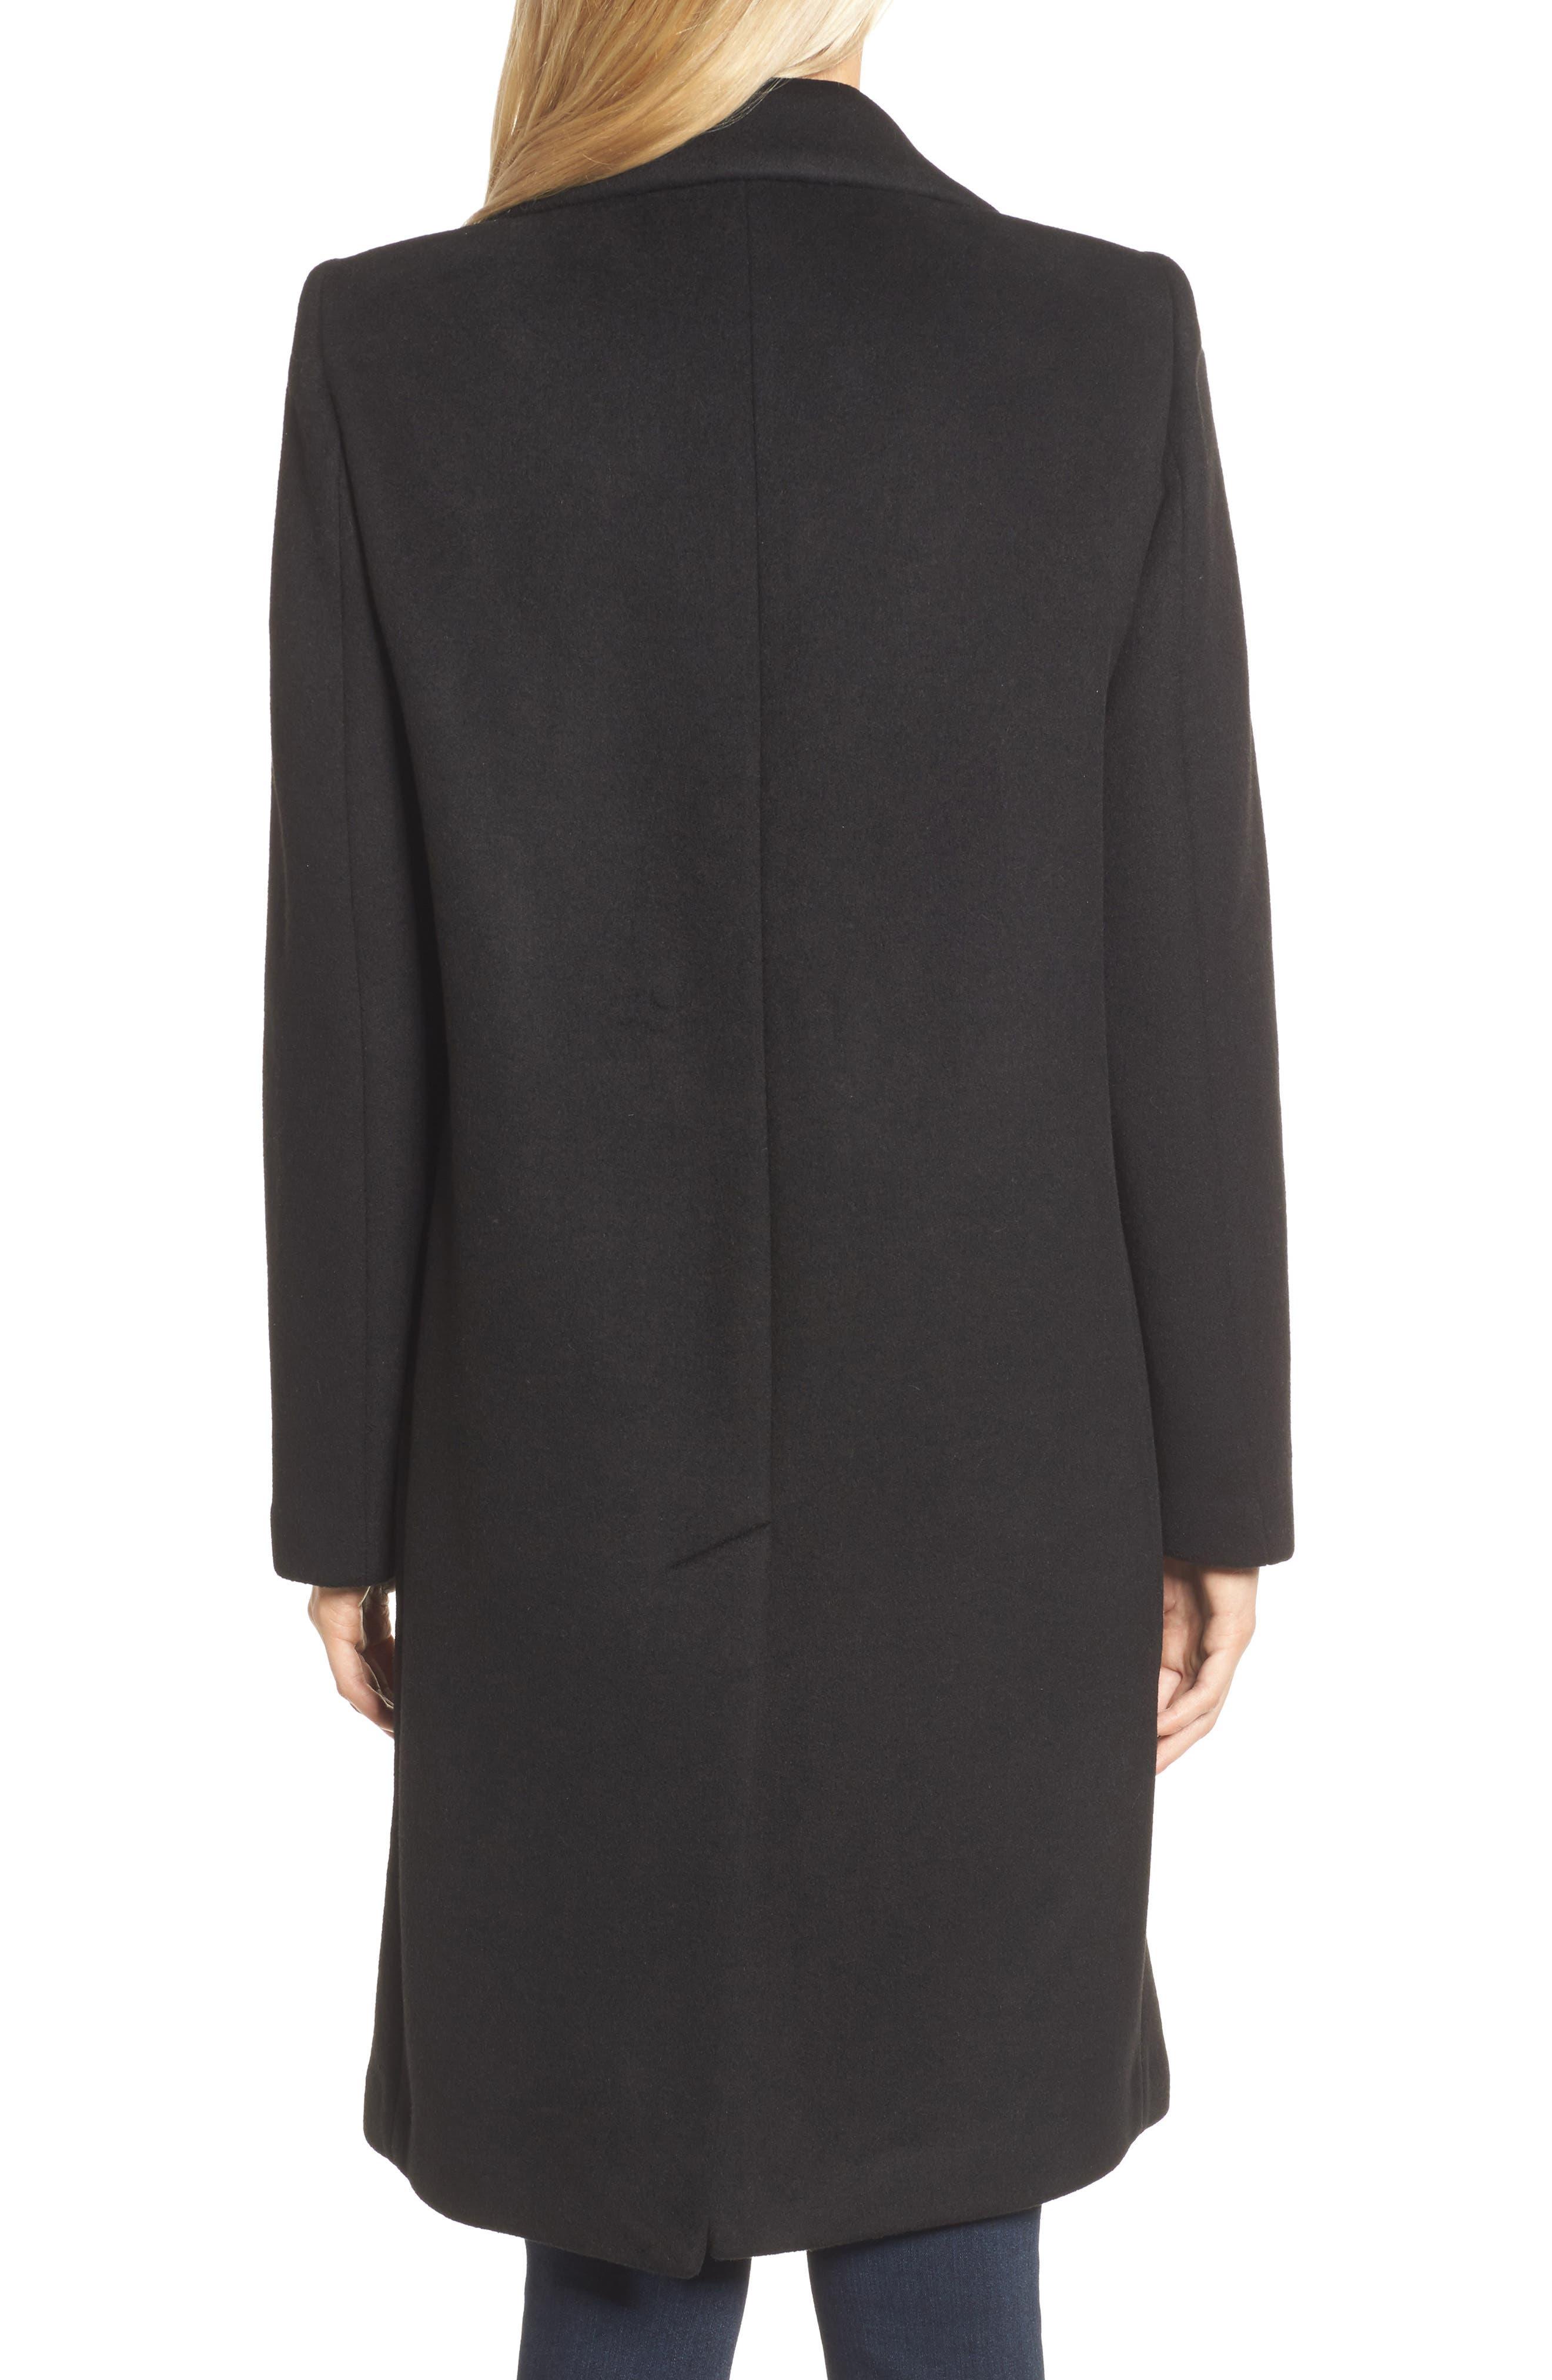 DKNY Lavish Wool Blend Coat,                             Alternate thumbnail 2, color,                             001